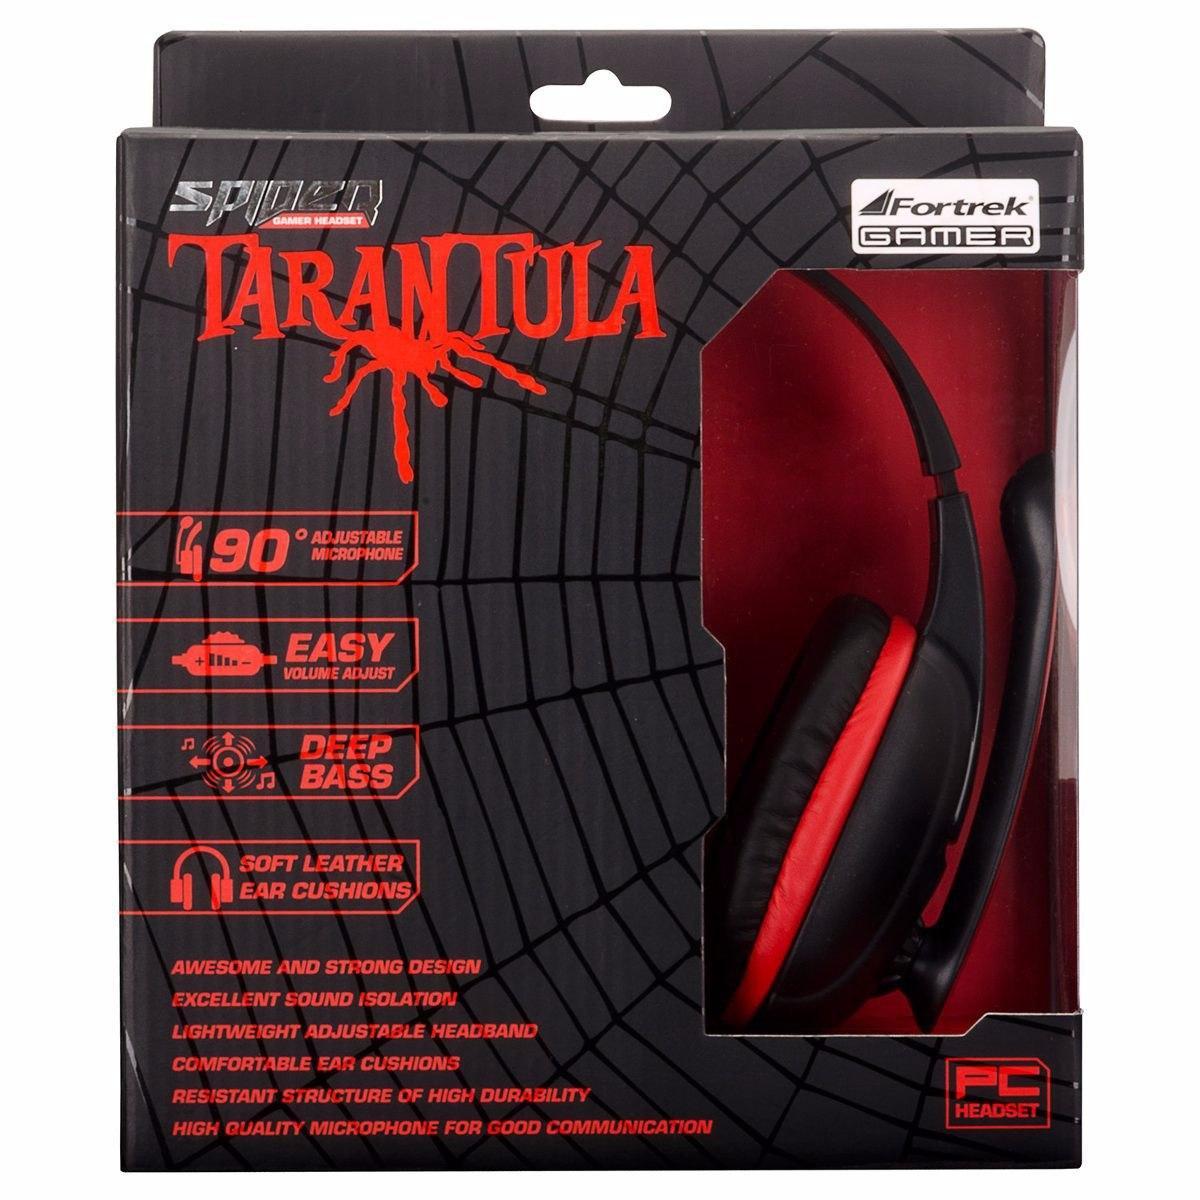 Headset Gamer Spider Tarantula PC/XBOX 360 SHS-702 Fortrek - Fone de